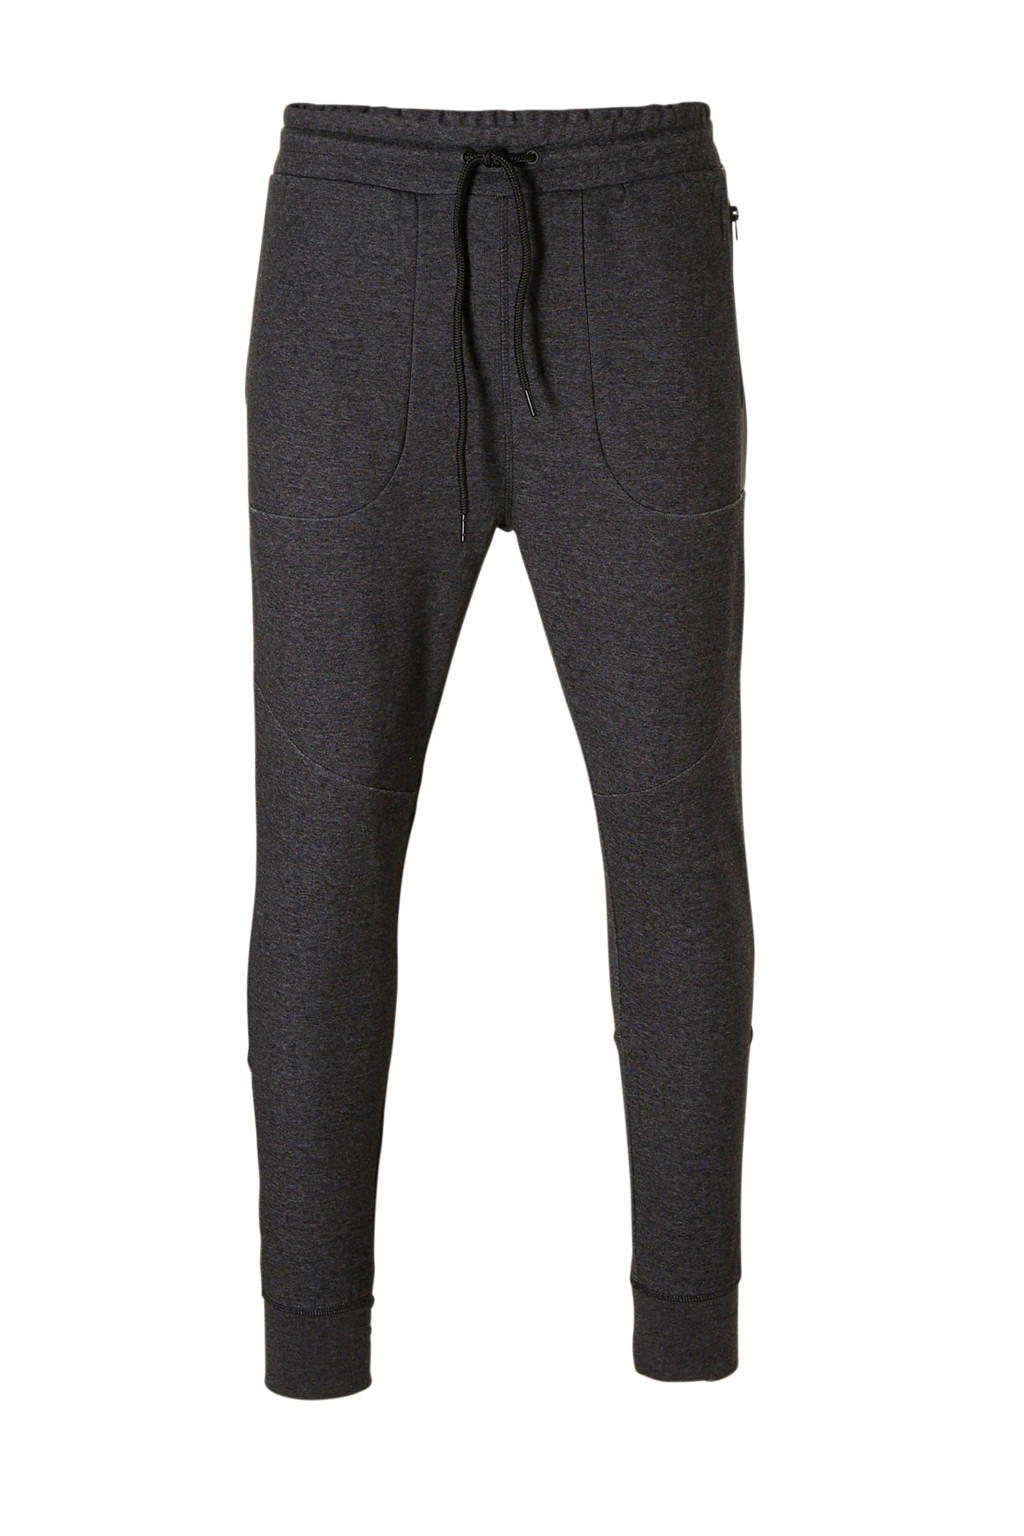 Jack & Jones Core Newwill sweatpants, Donkergrijs melange